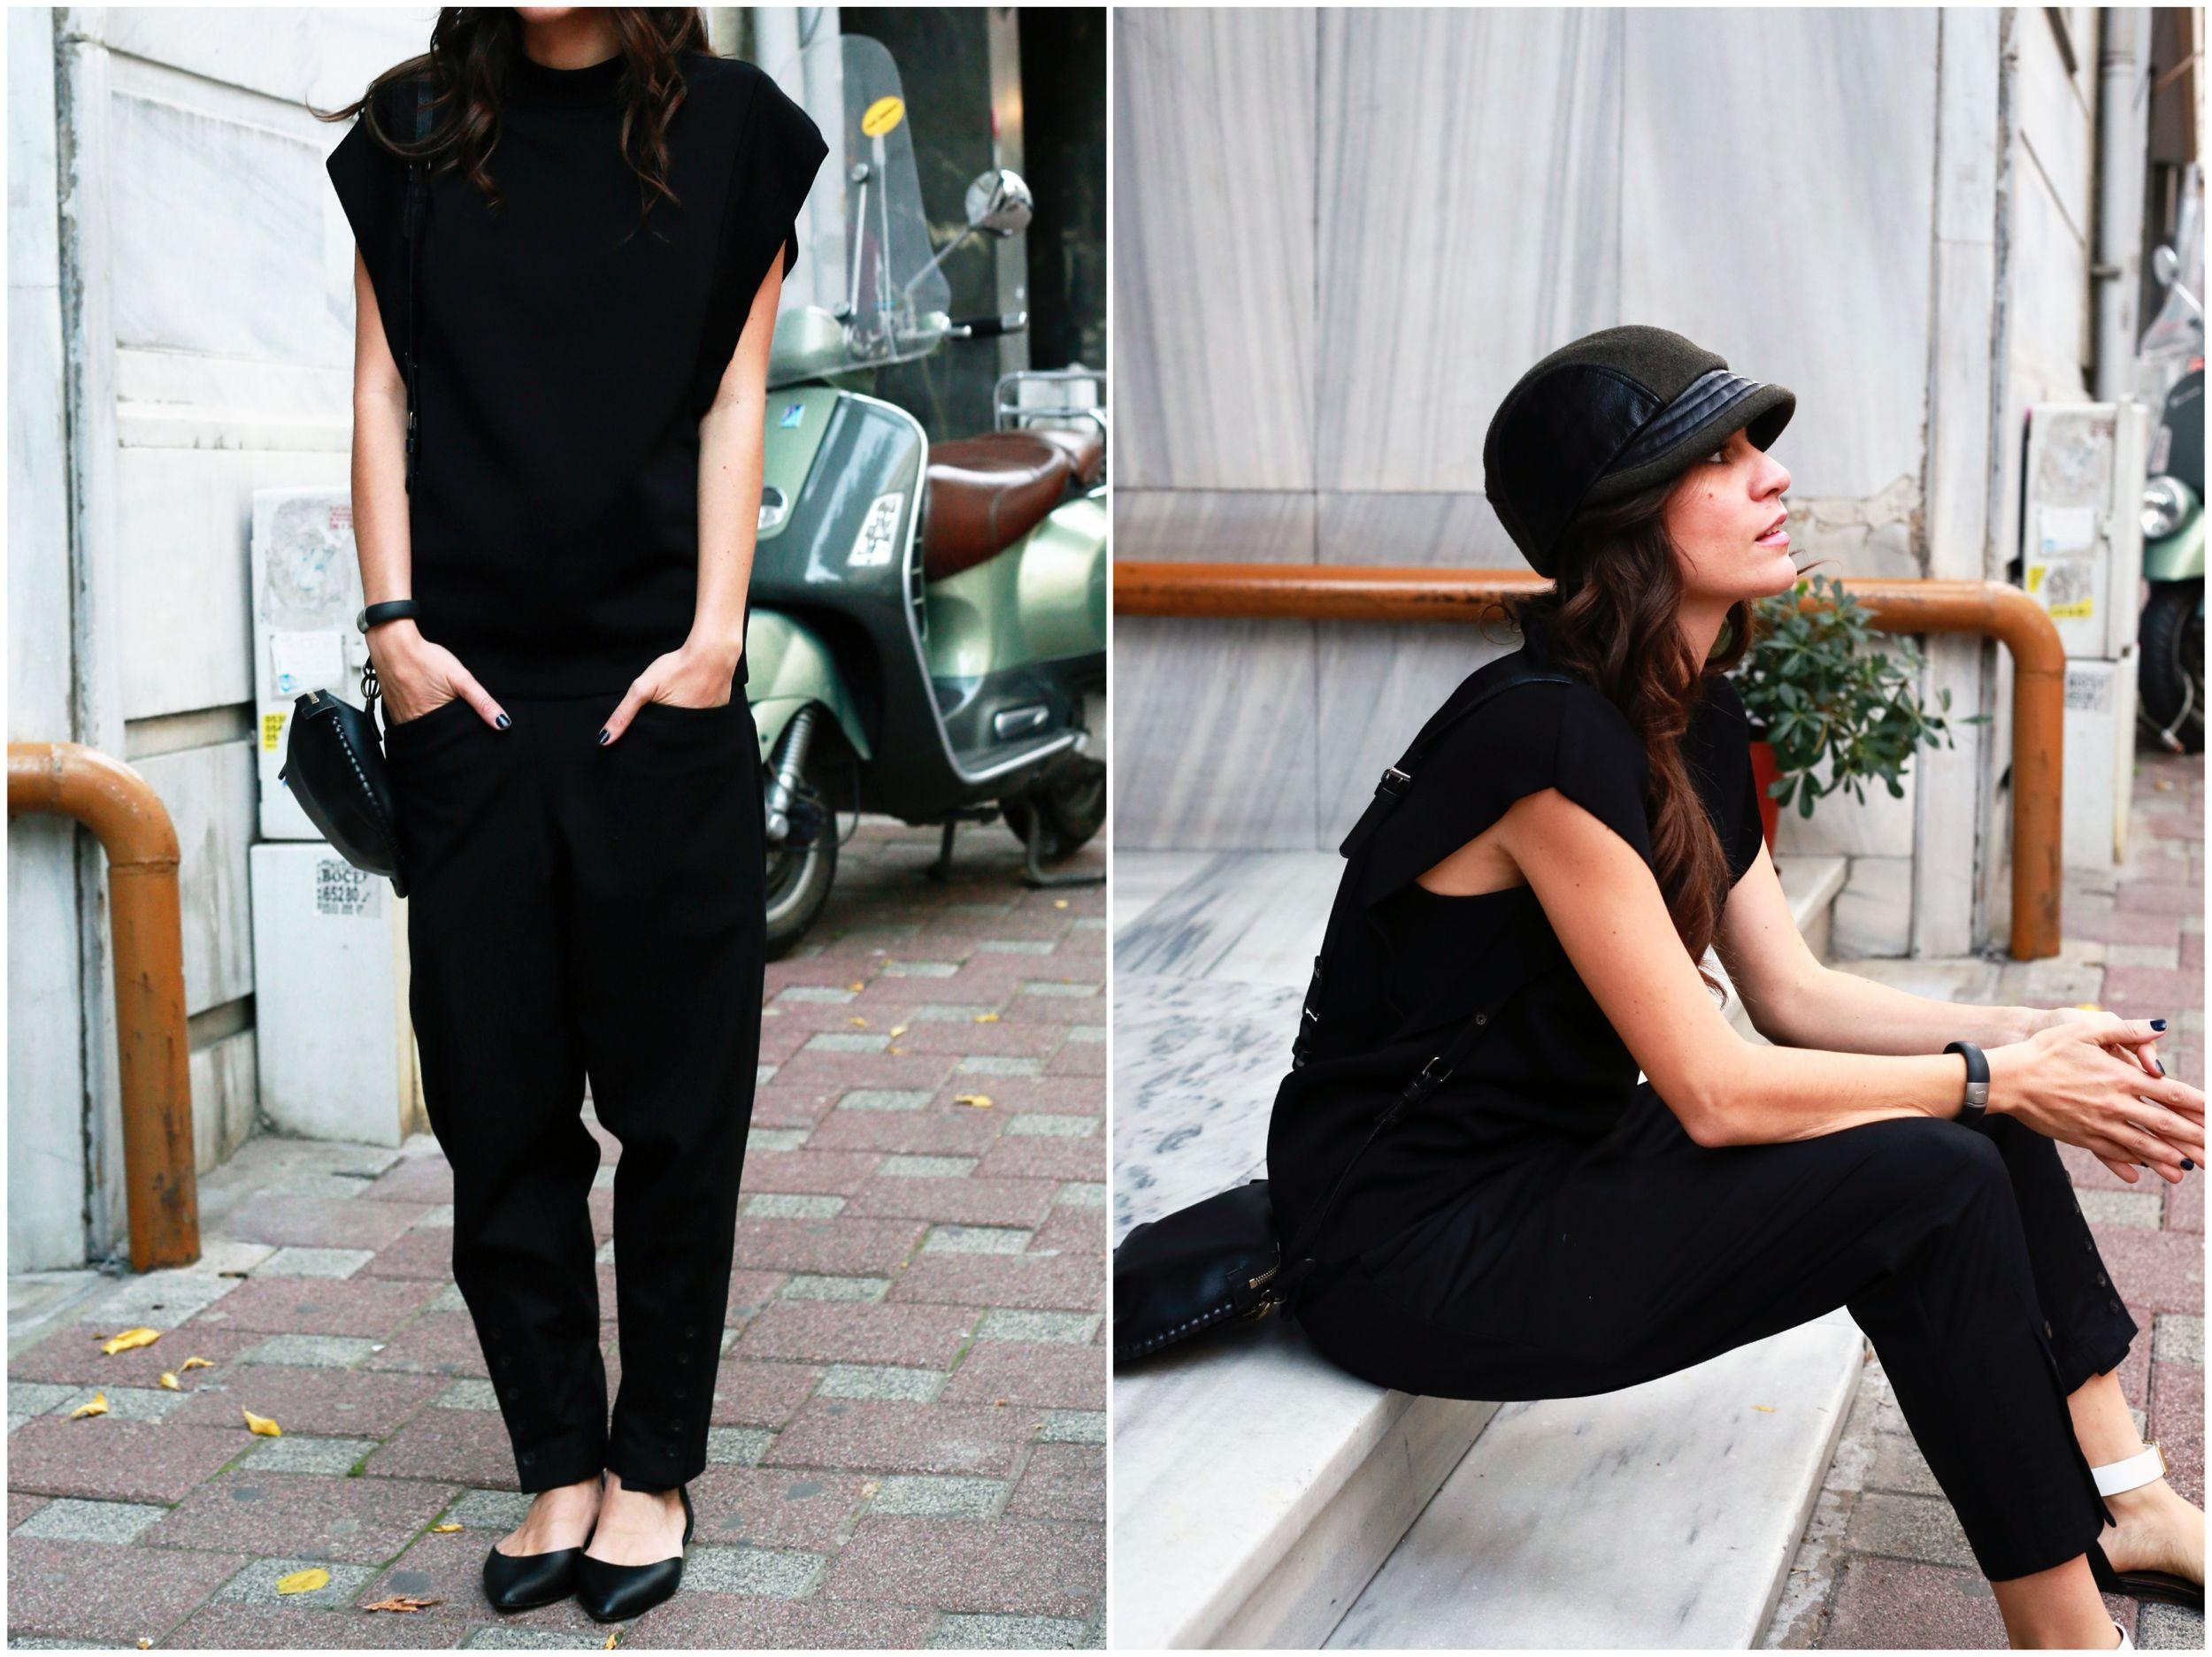 cos, cos stores, black, cap, outfit, street style, ümit ünal, marni, off ne giysem, barney's, ny, jacqueline lamont,